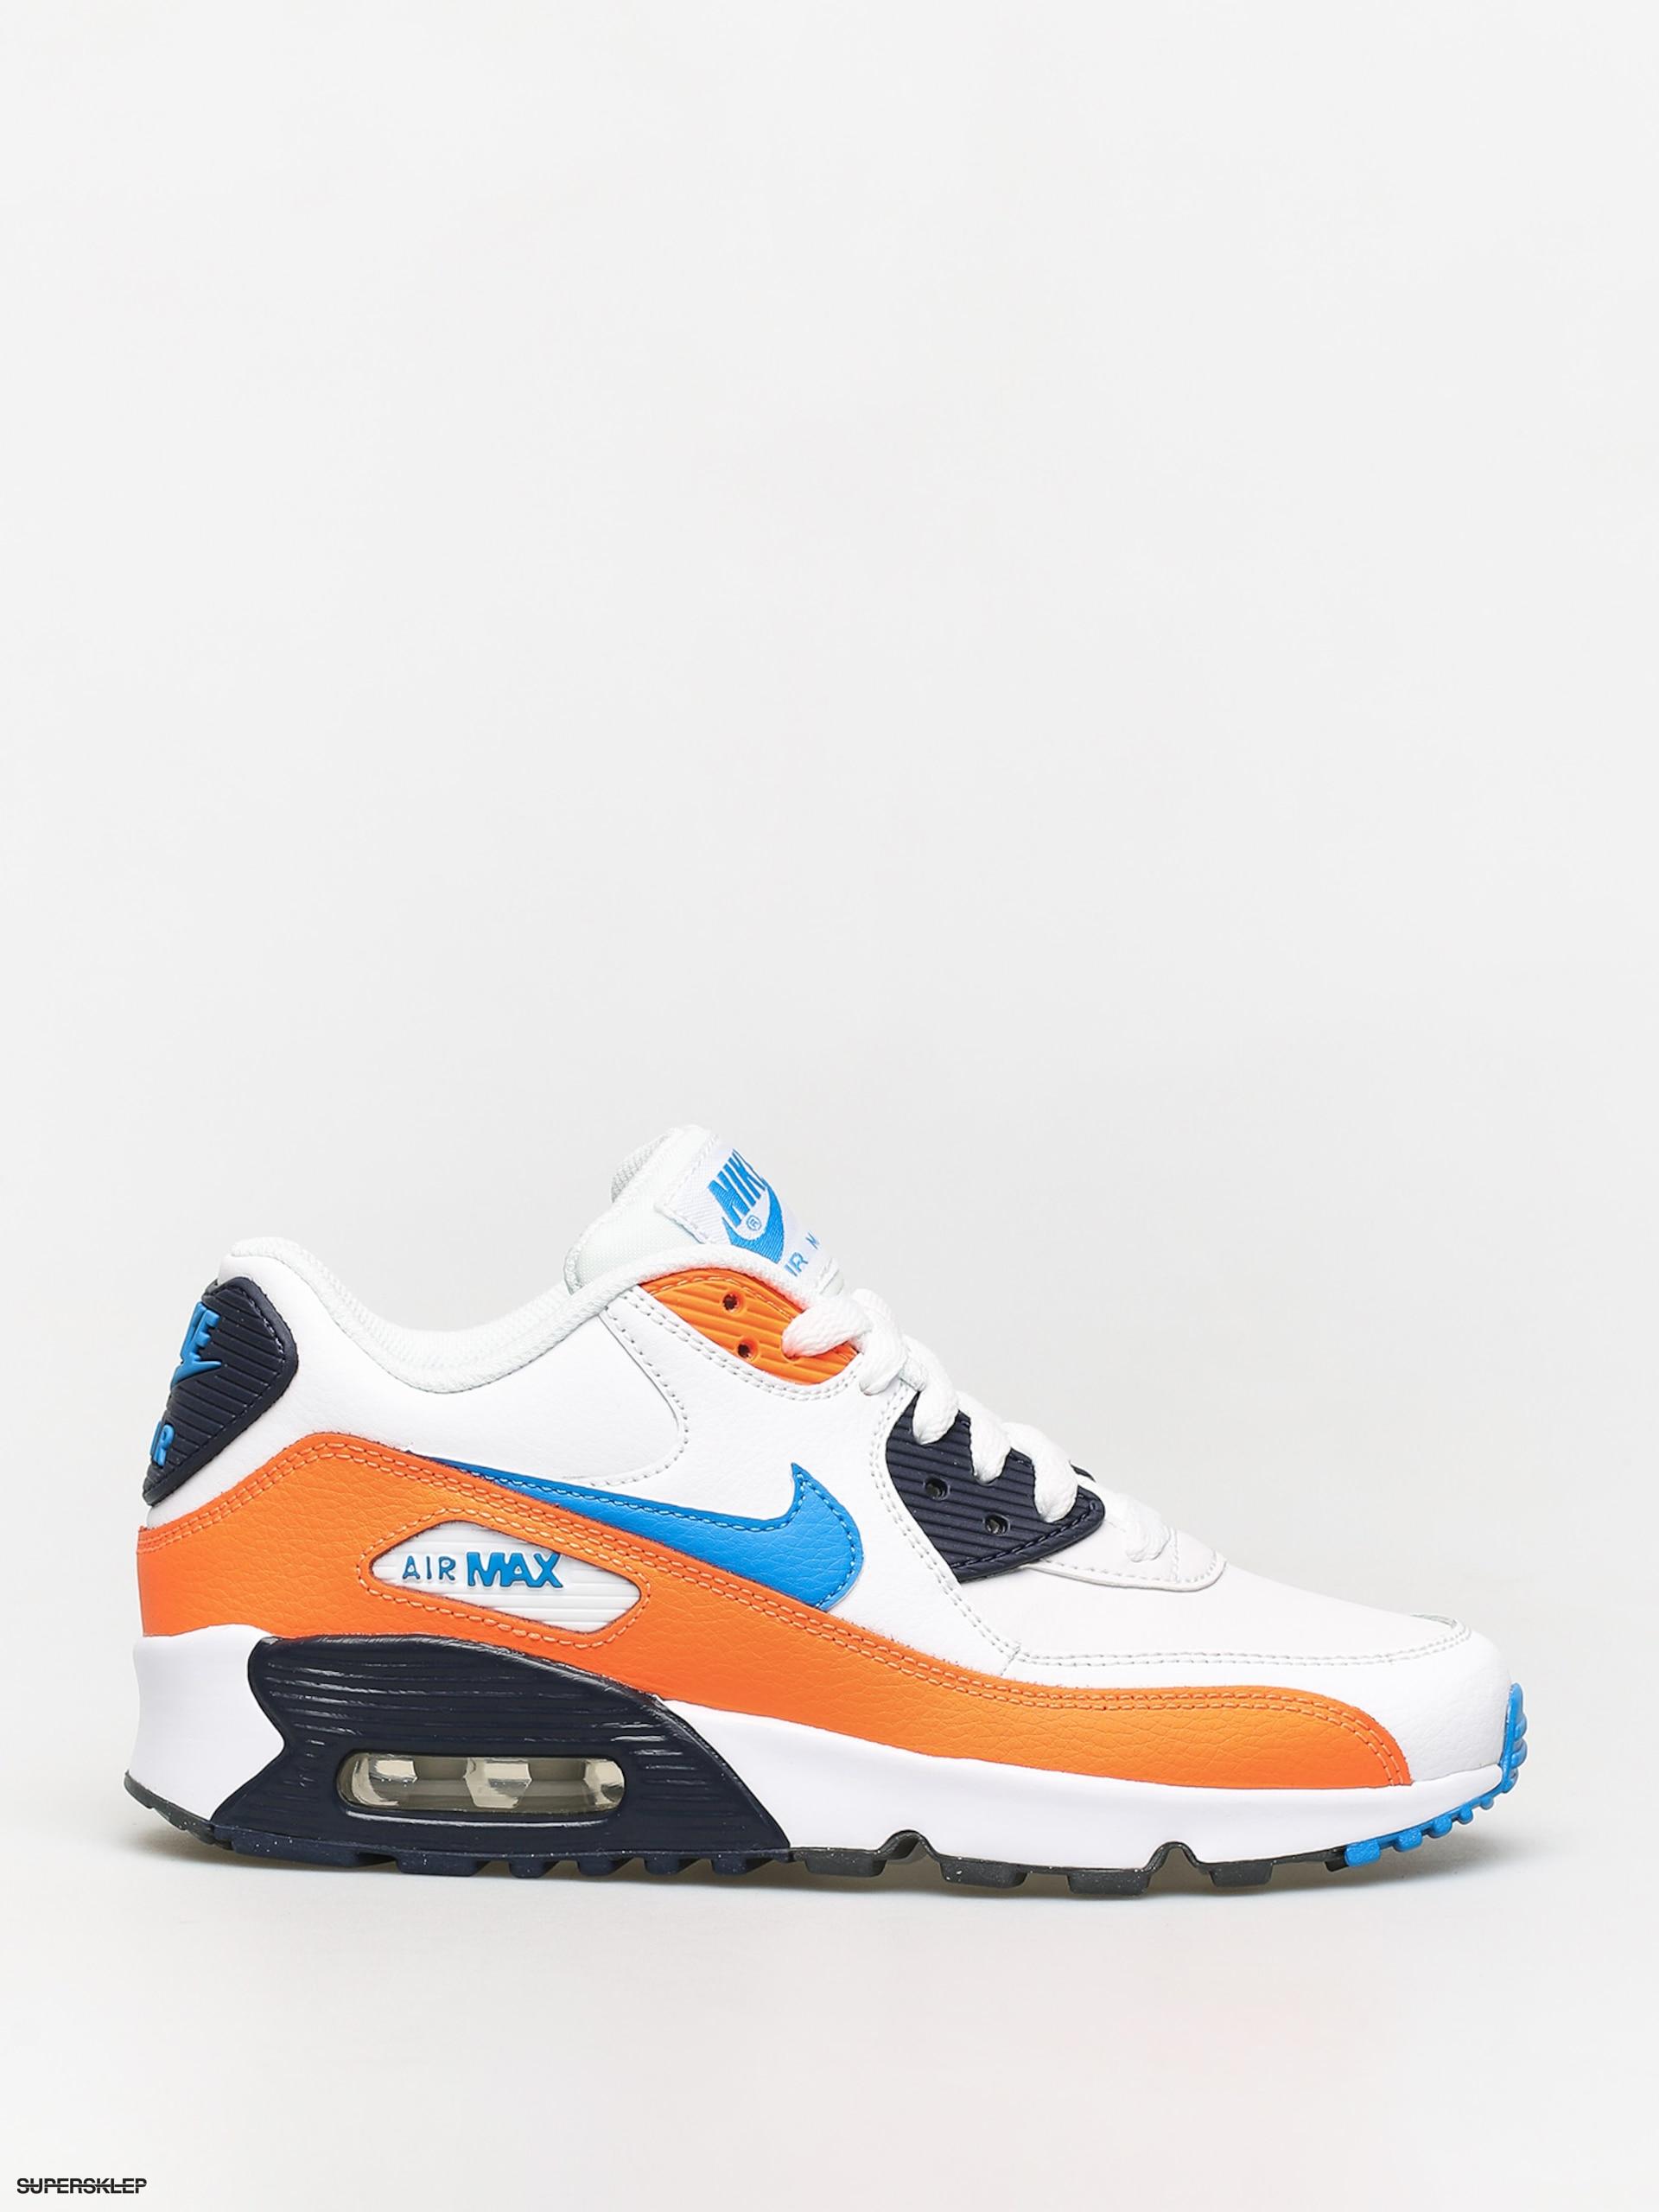 Nike Air Max 90 Ltr (GS) 833412 116 WhitePhoto BlueTotal Orange